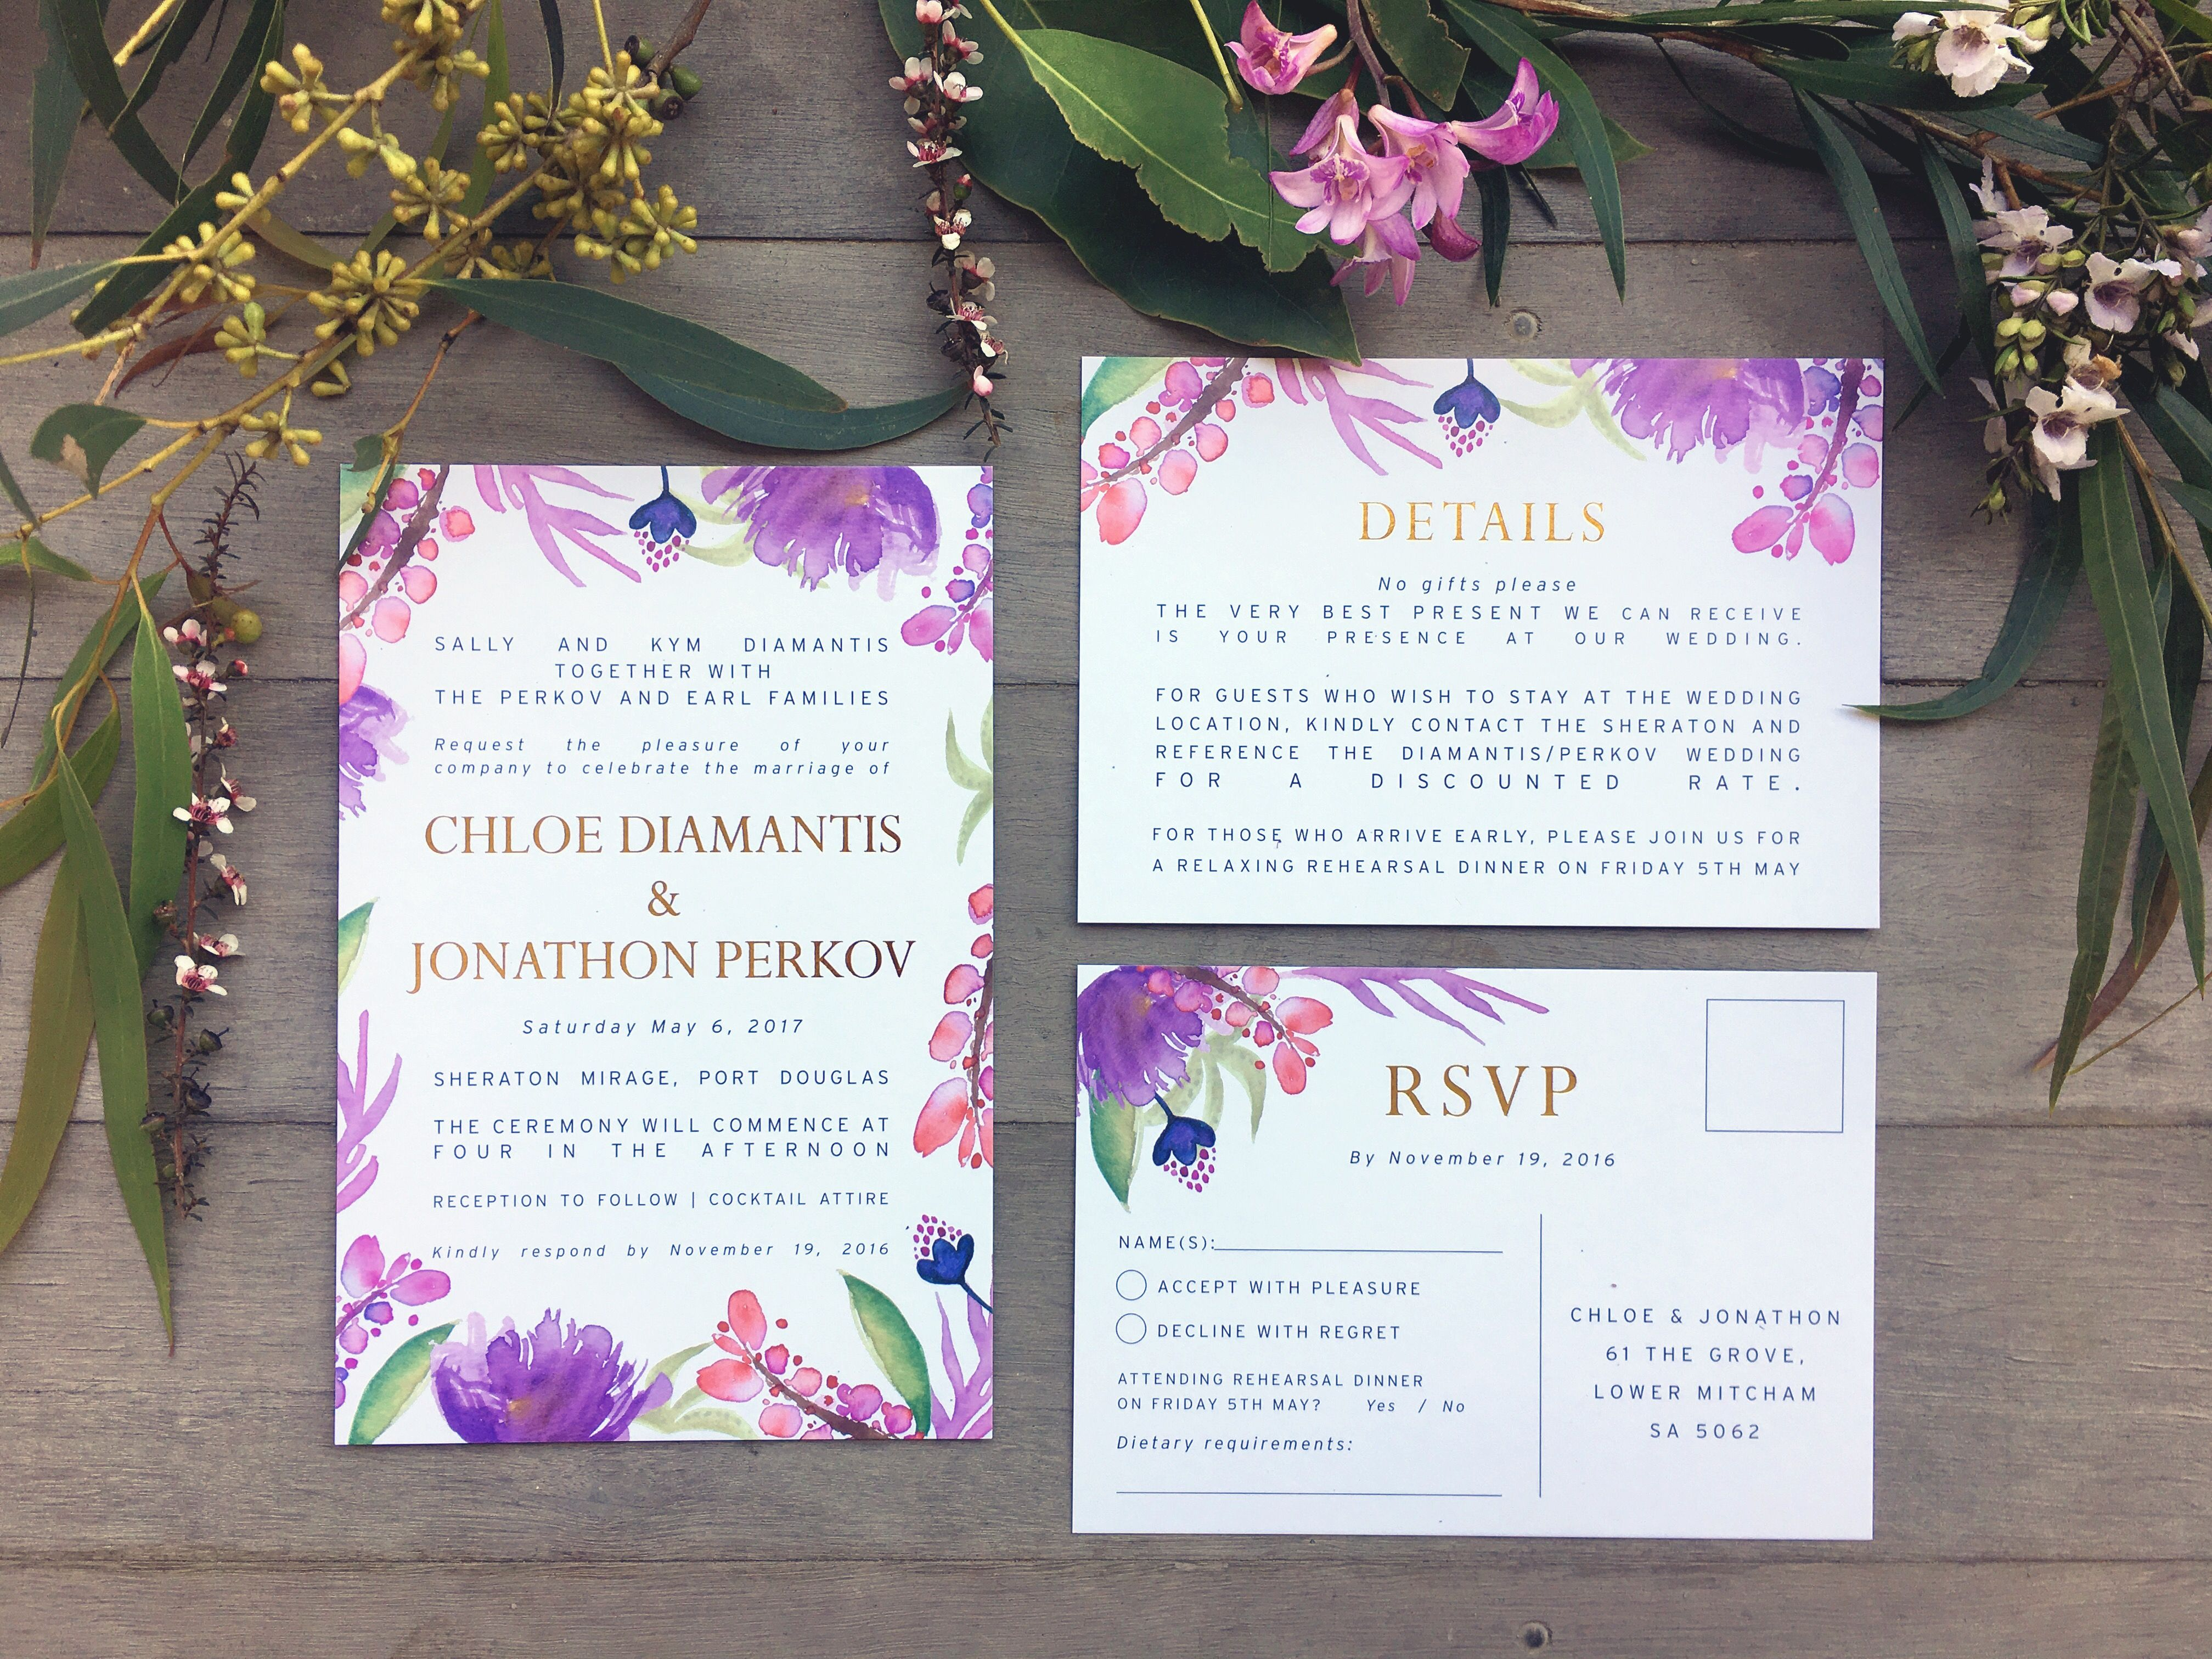 card templates for wedding invitation%0A Tropical purple island destination Hawaii Bali Fiji bora bora Maui  Queensland port Douglas gold foil RSVP    Invitation DesignBest